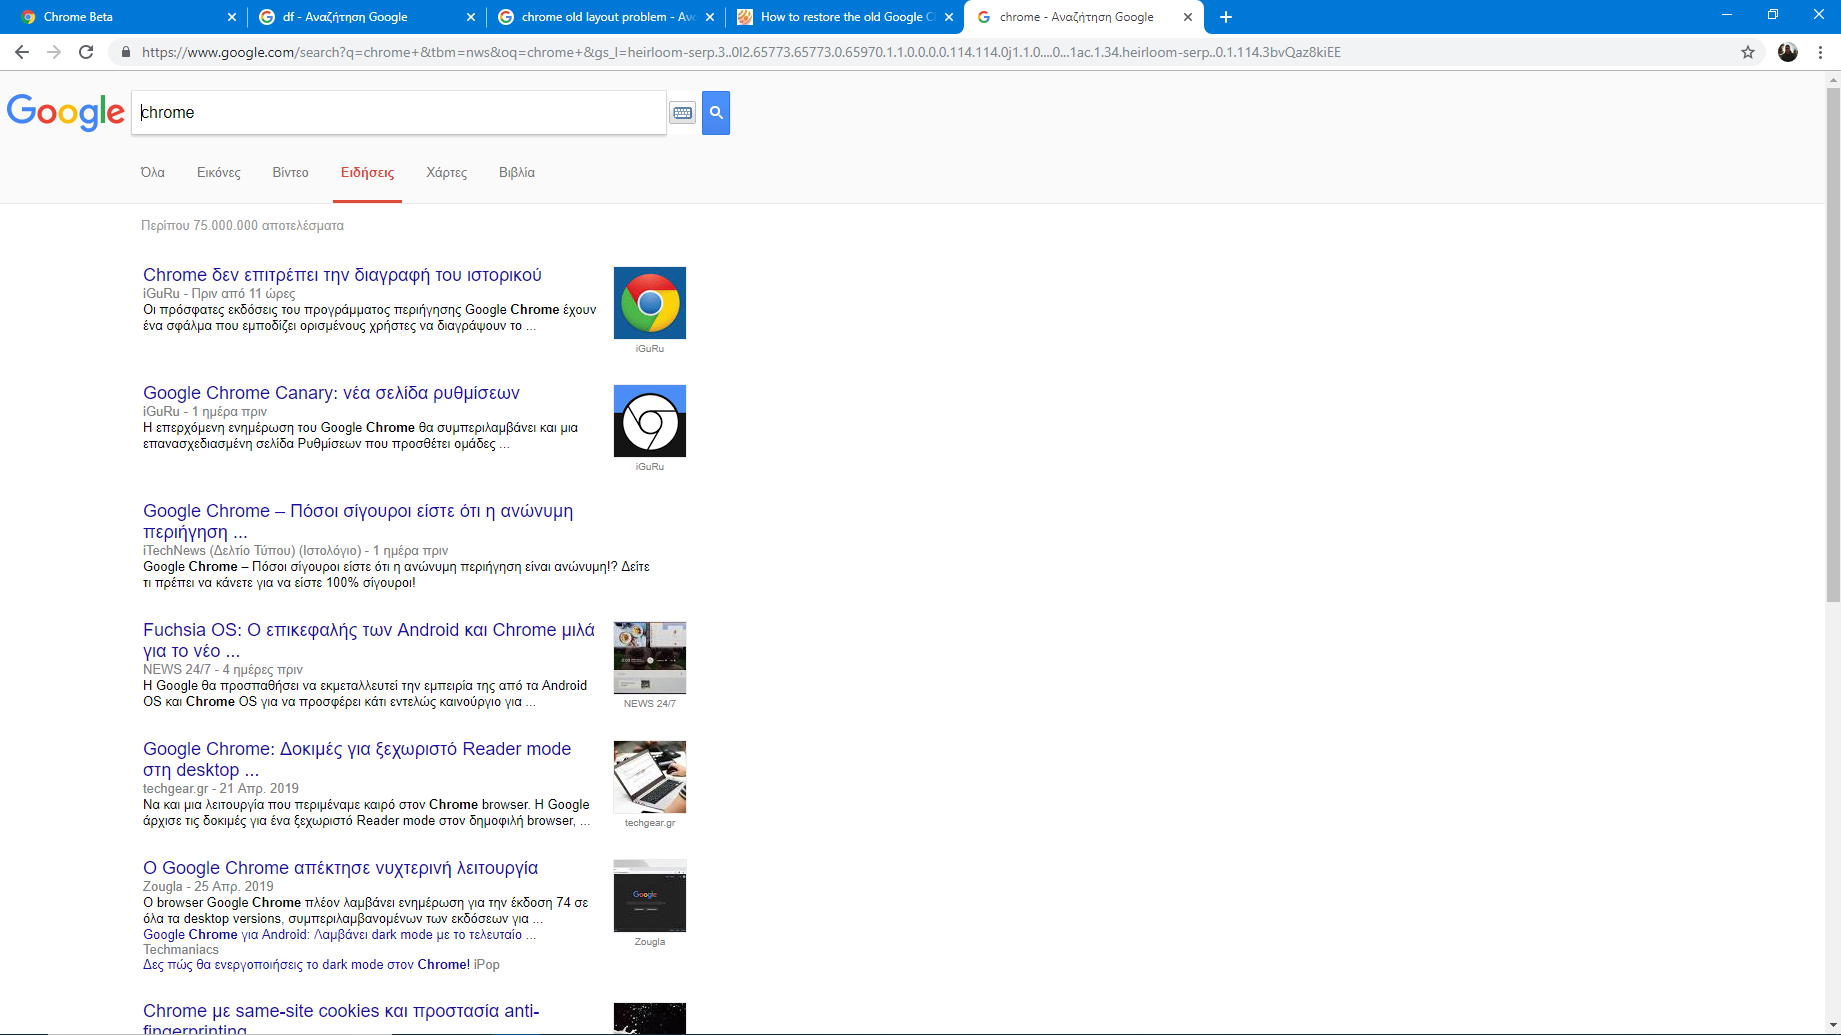 Why am i seeing chrome like this? - Google Chrome Help